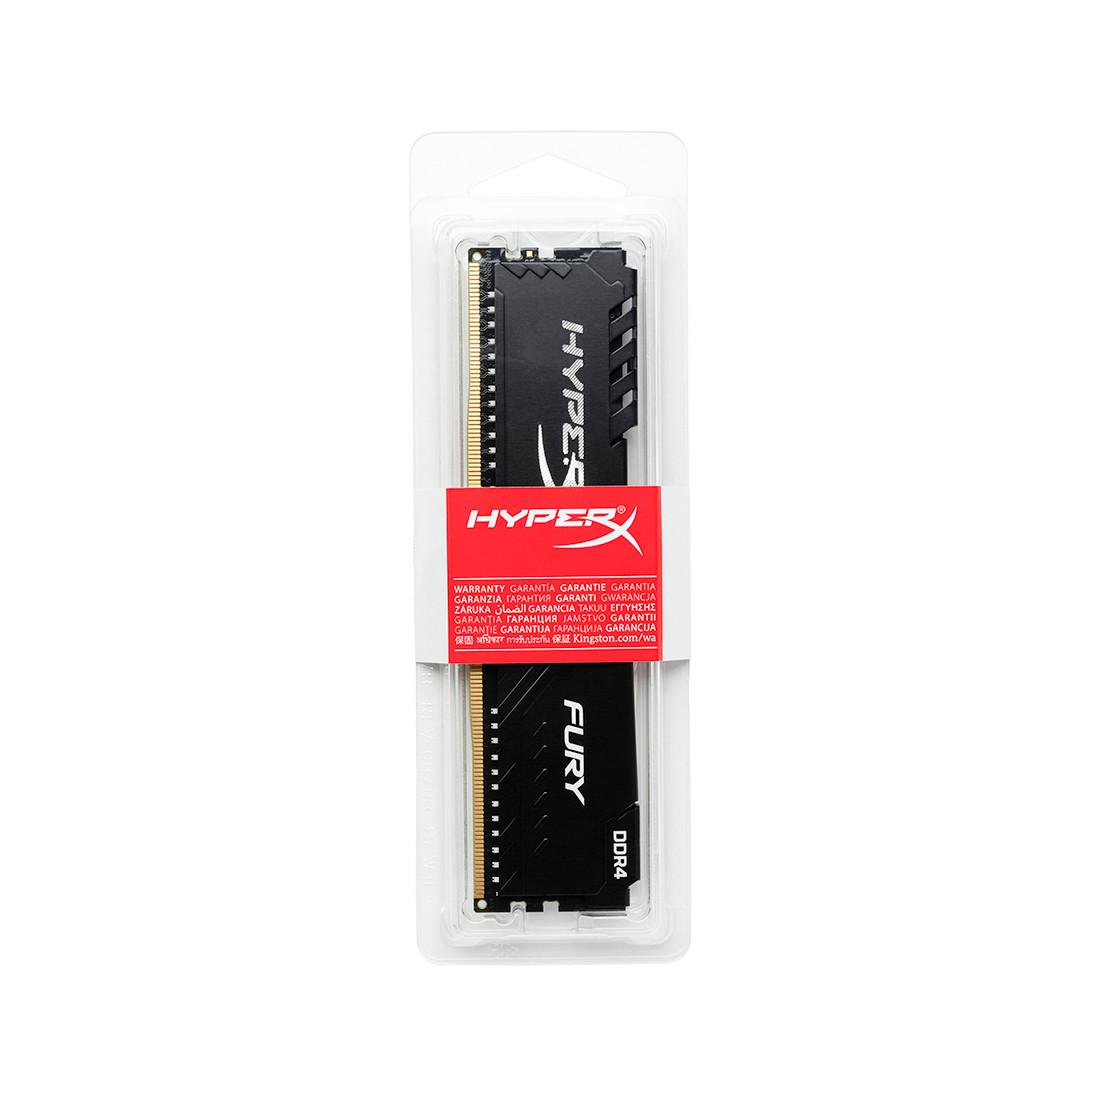 Модуль памяти Kingston HyperX Fury HX430C15FB3/16 (DDR4, 16GB, DIMM) - фото 2